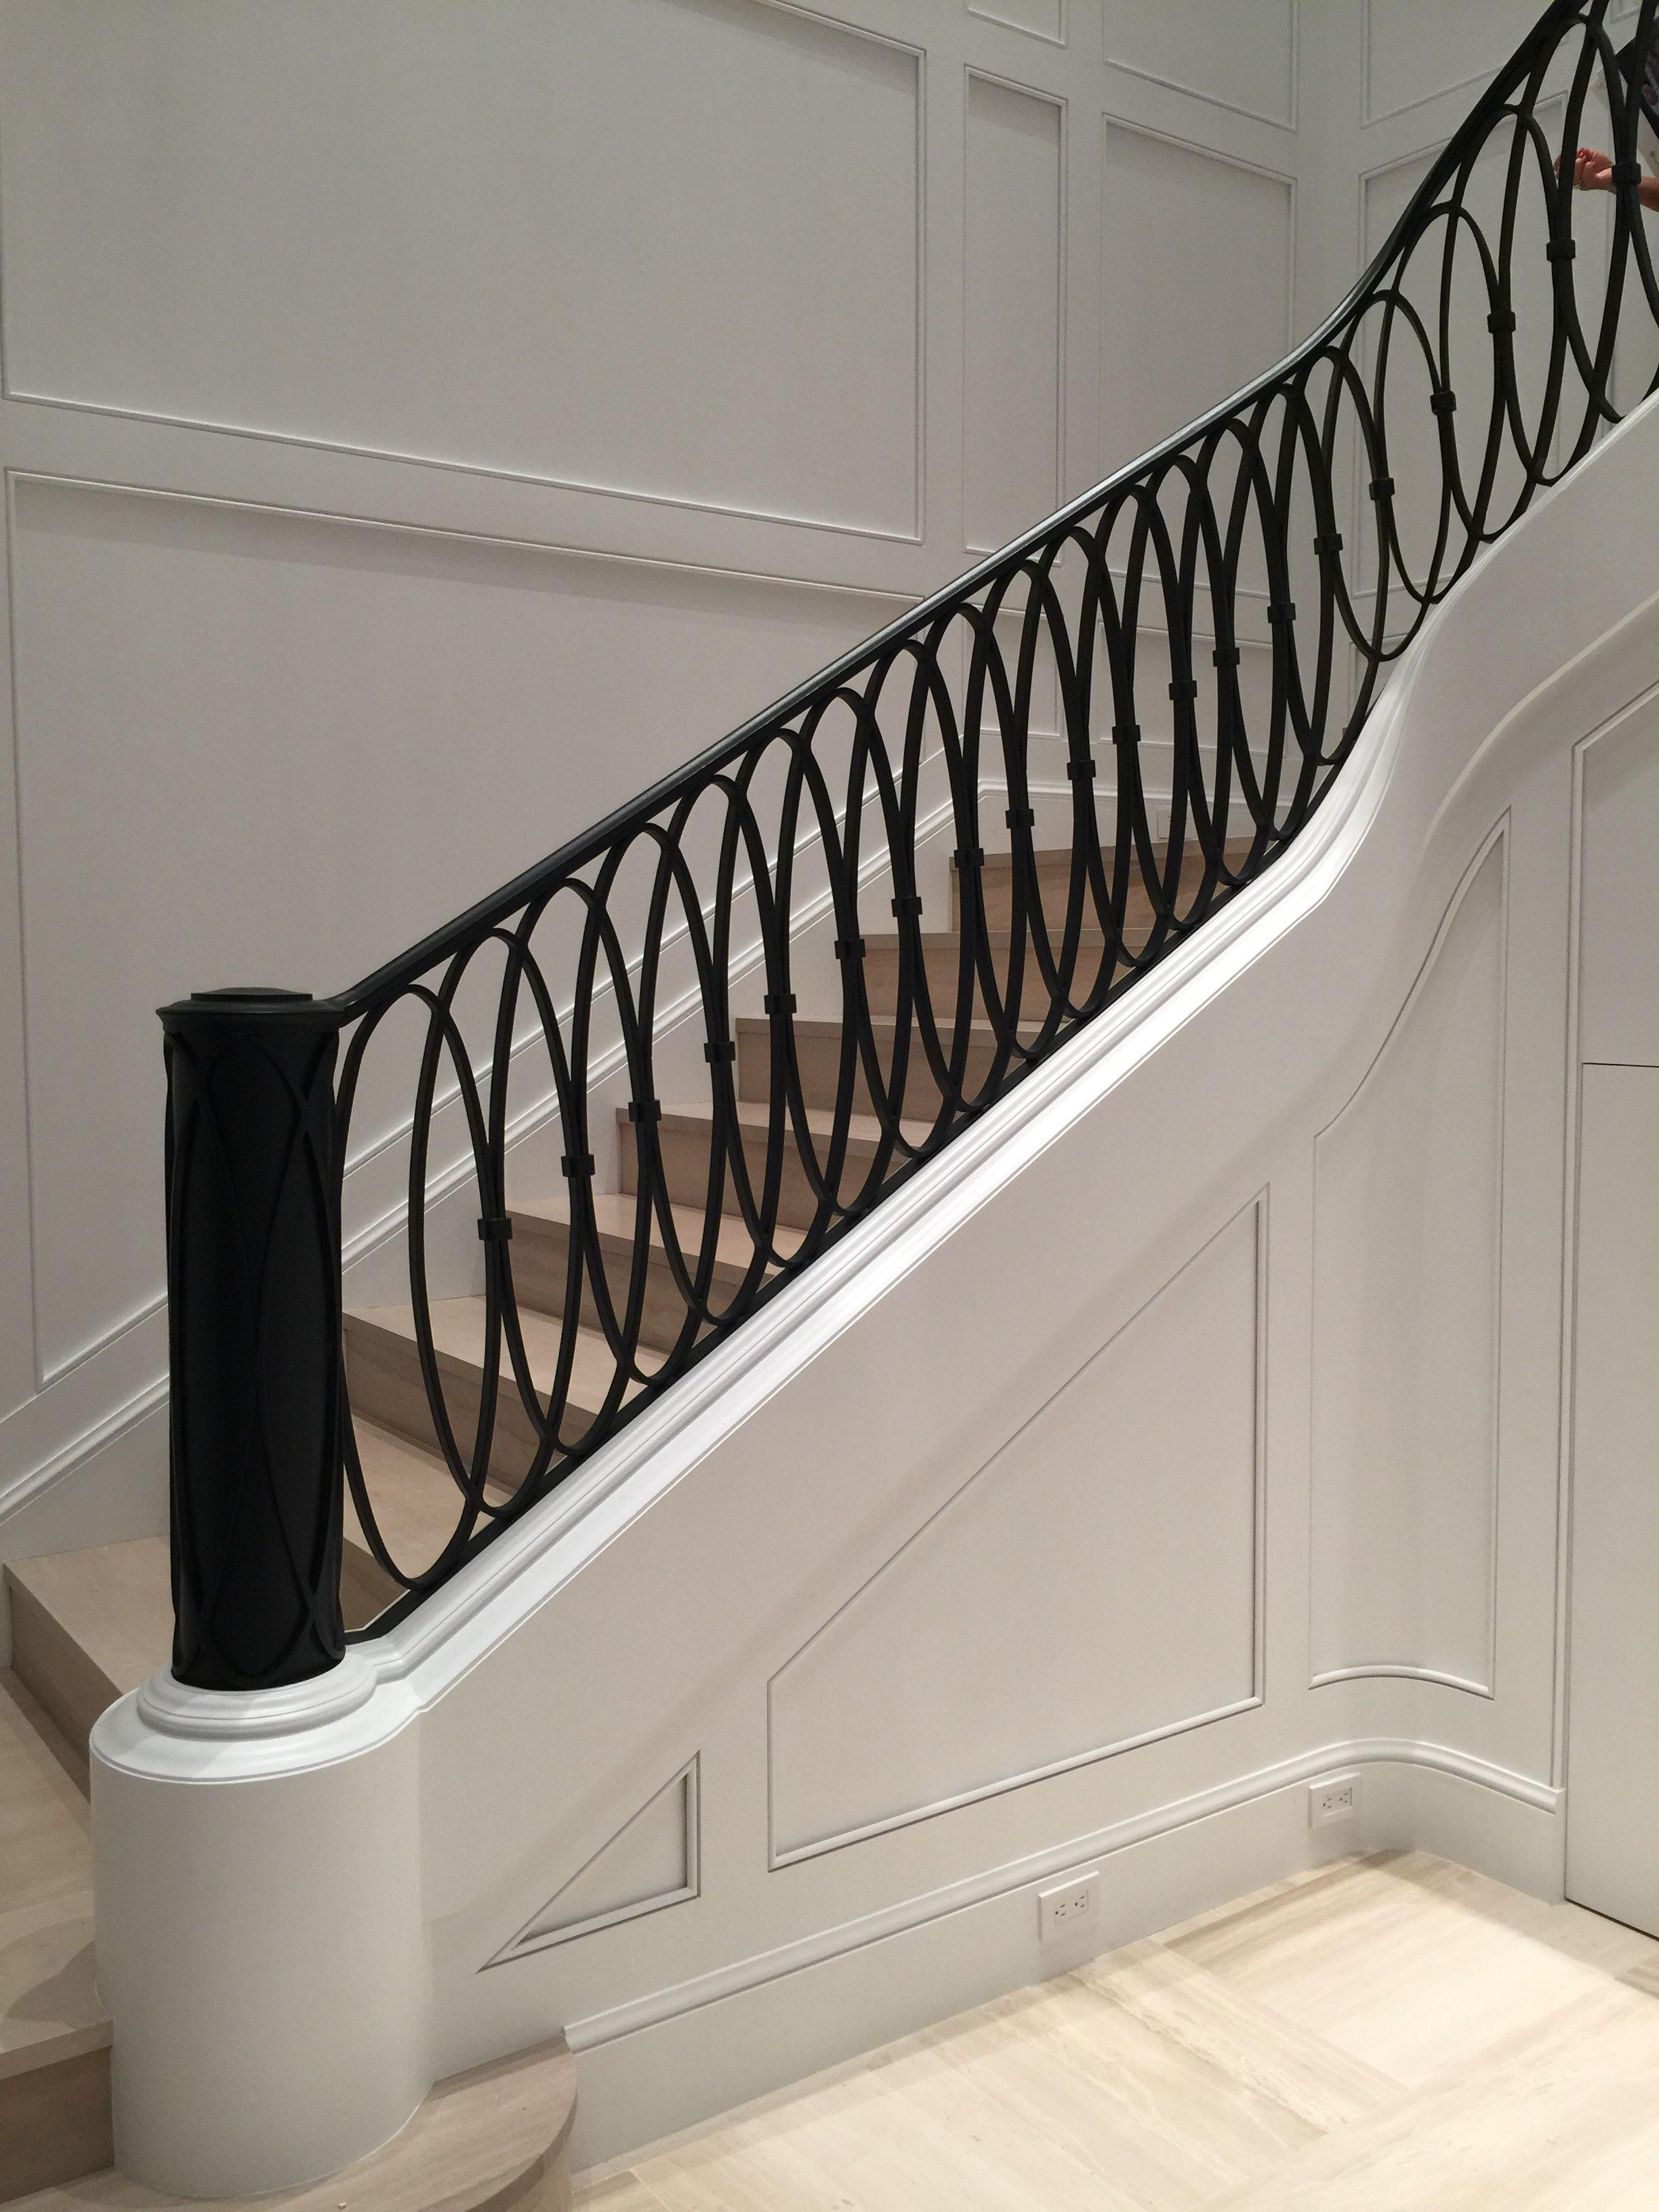 Best Interesting Newel Post Stairway Design Interior Stairs Wrought Iron Stair Railing 400 x 300